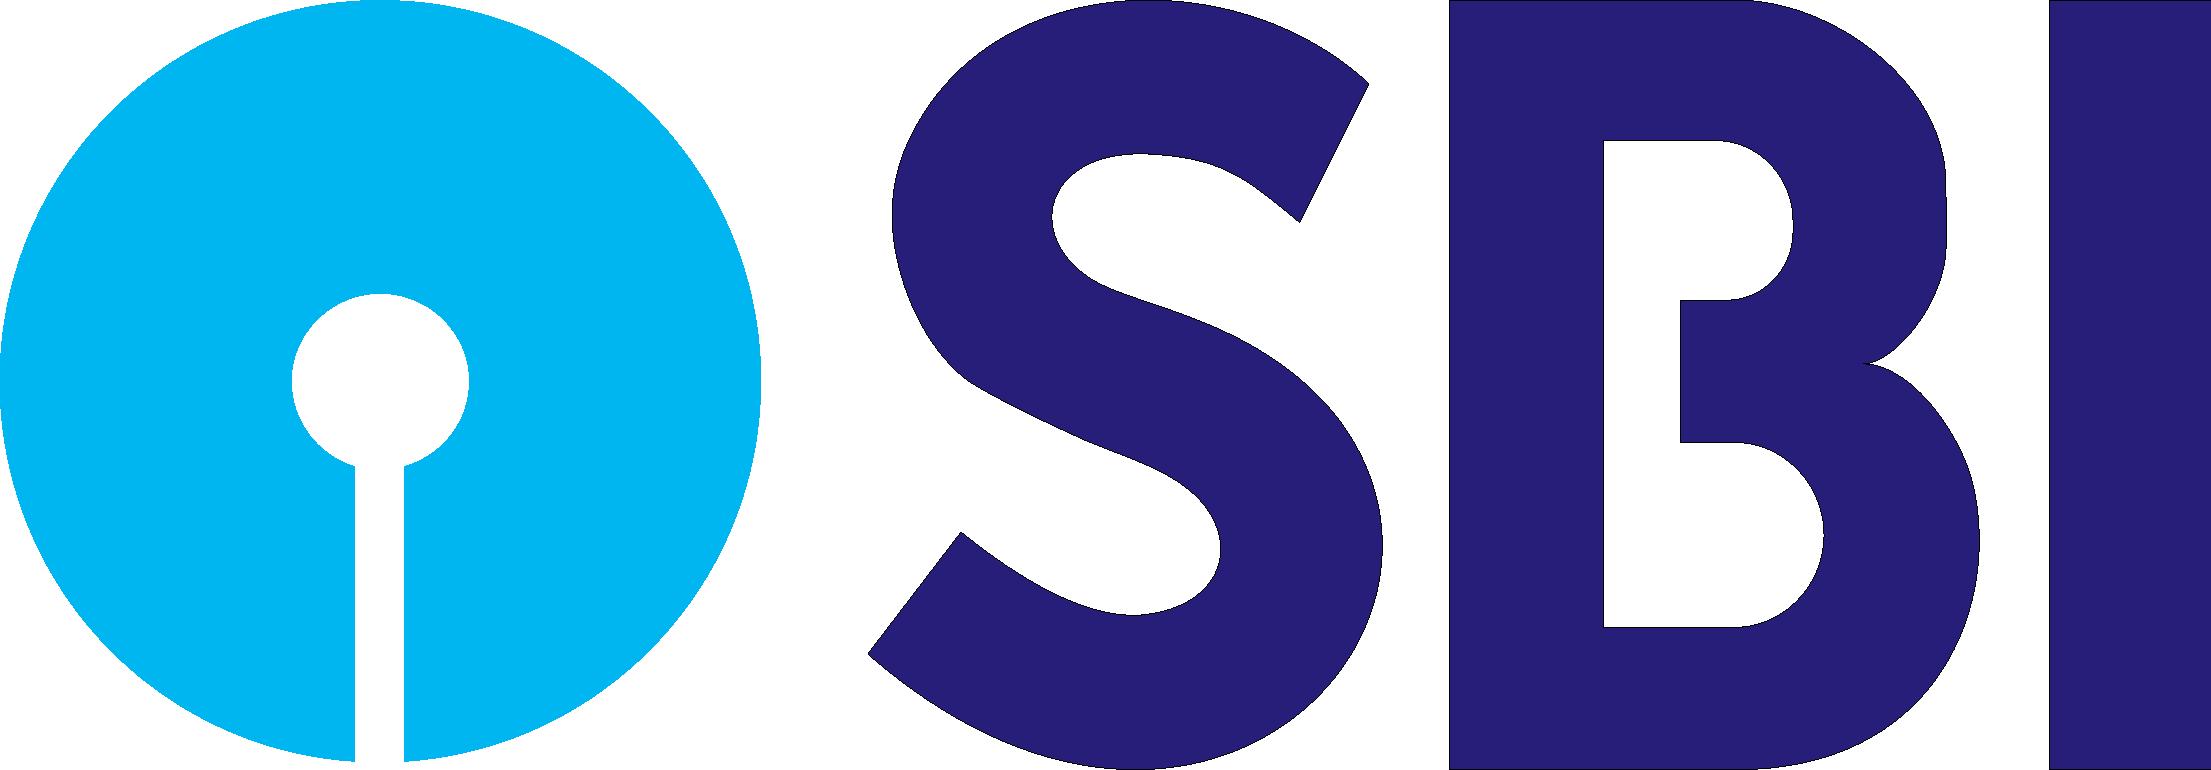 sbi logo [State Bank of India Group] Vector EPS Free Download, Logo.